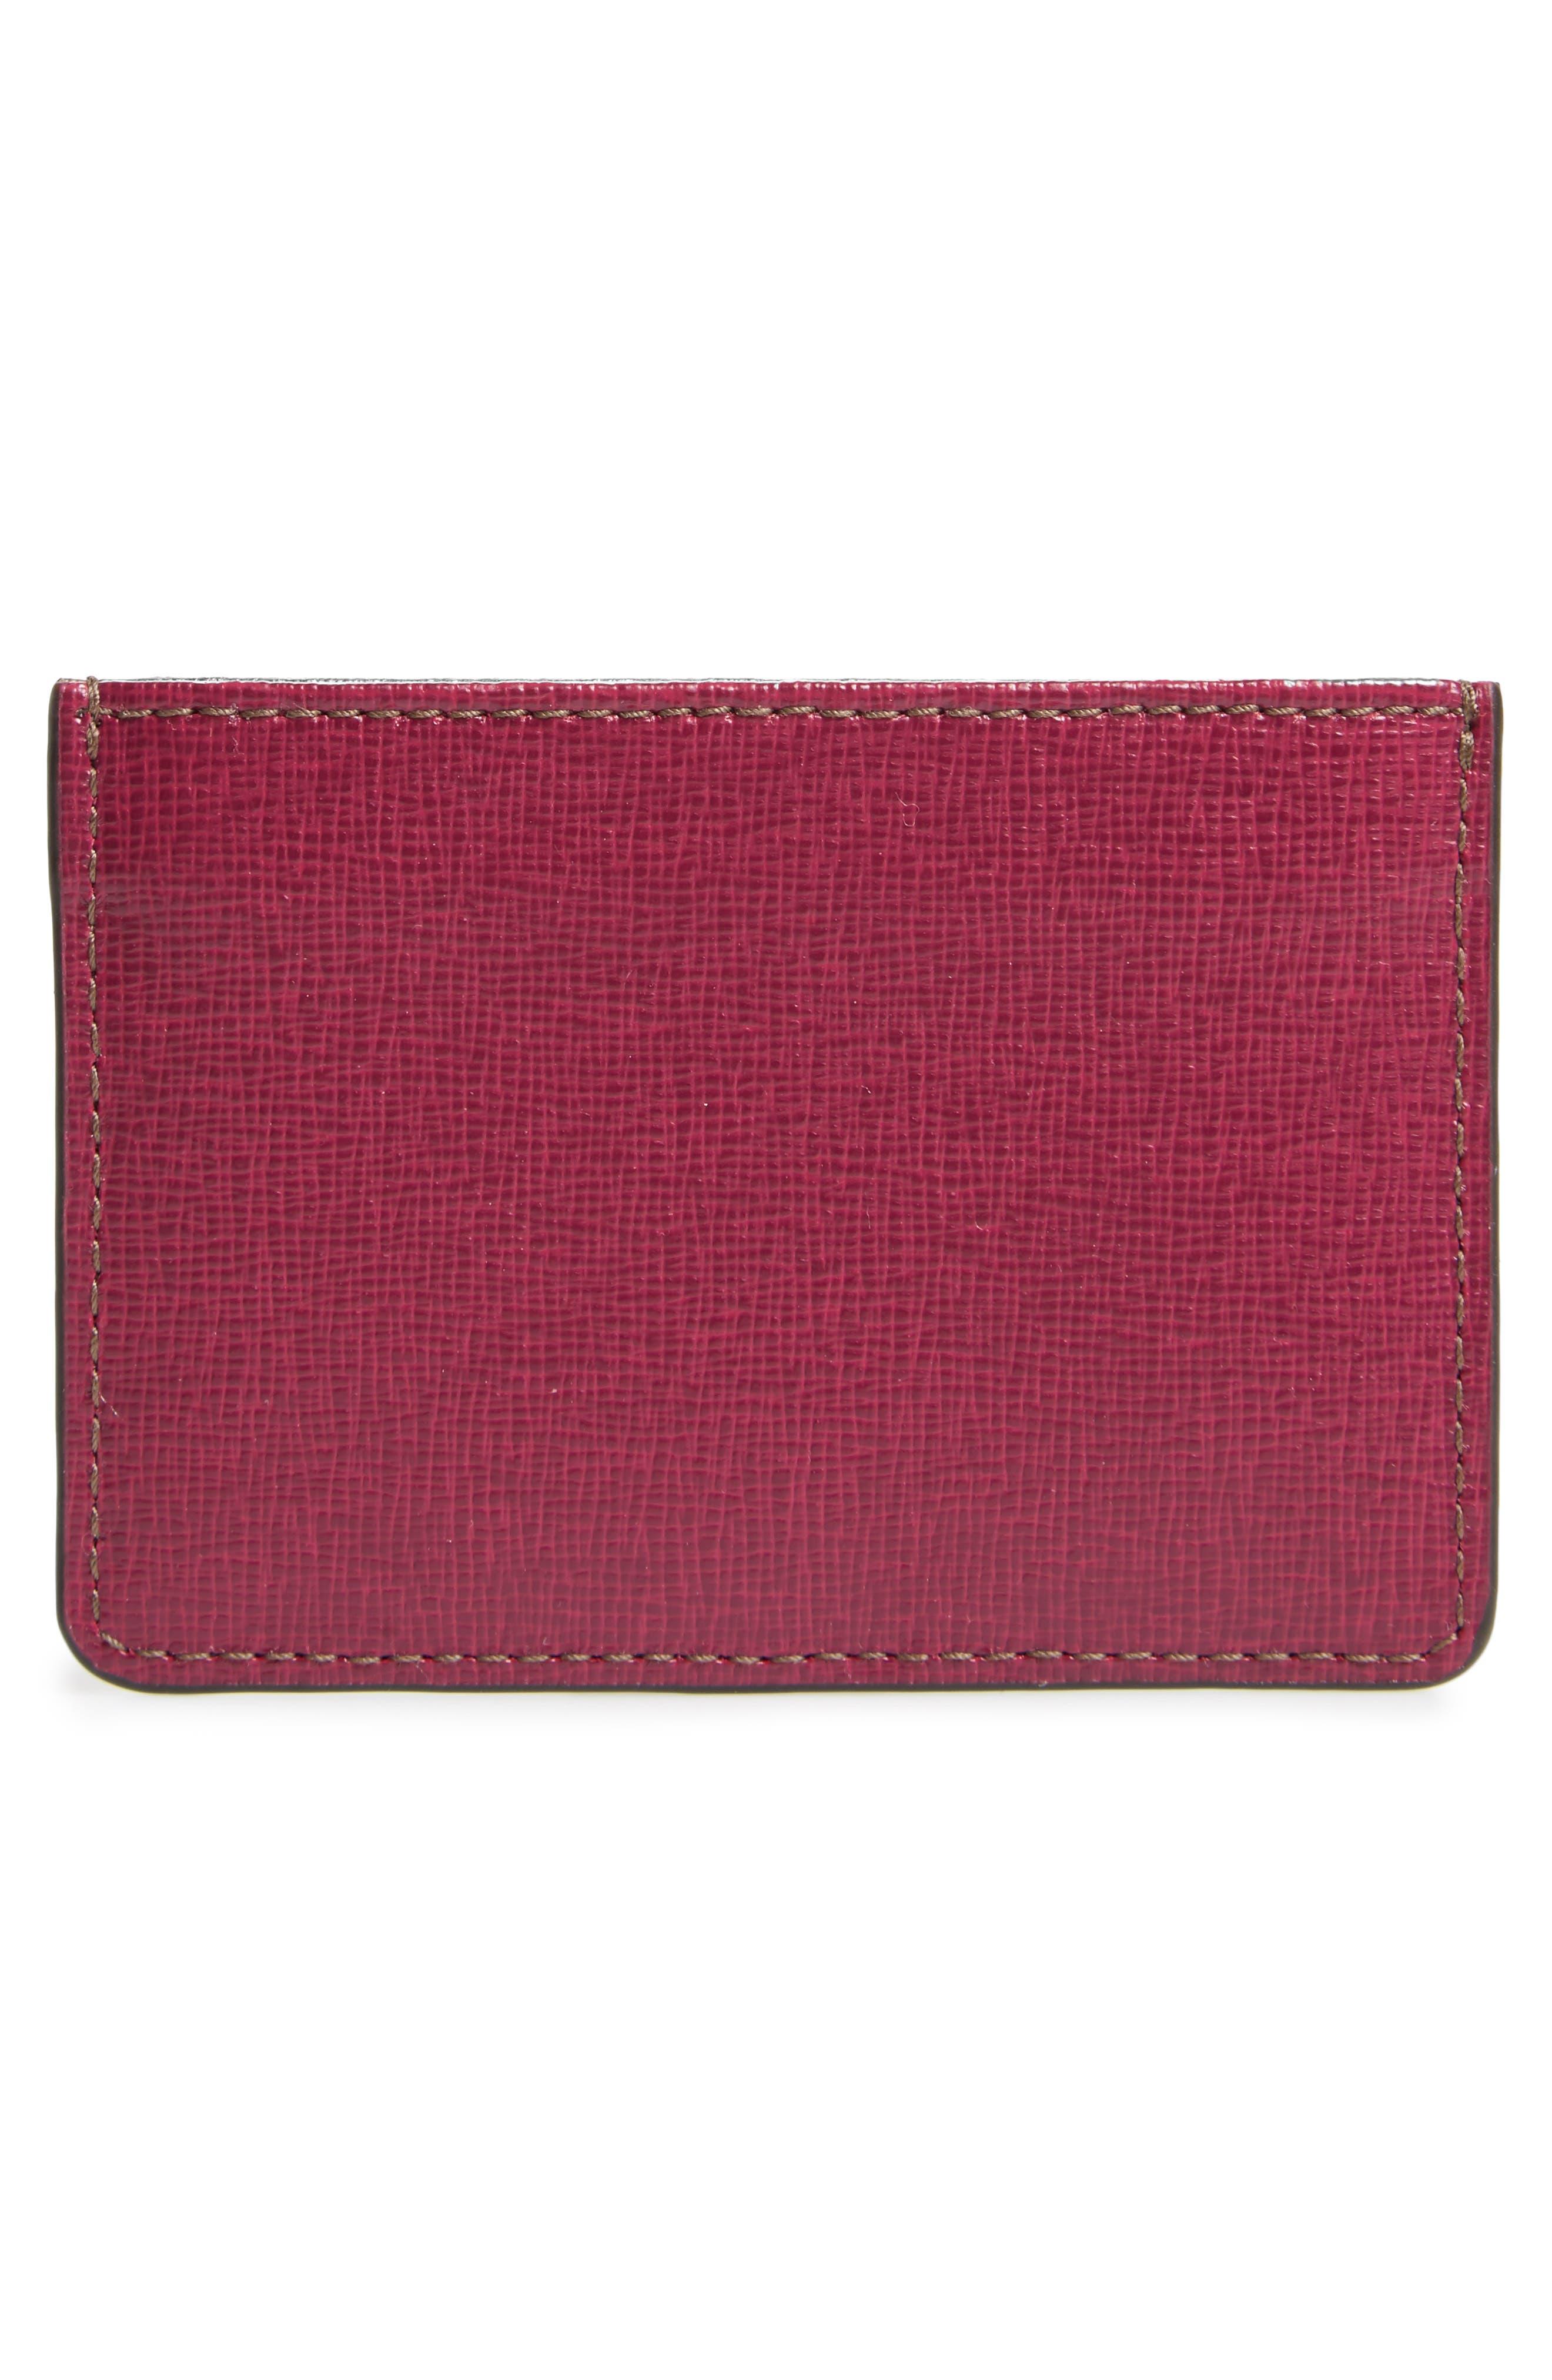 Gioia Saffiano Leather Card Case,                             Alternate thumbnail 6, color,